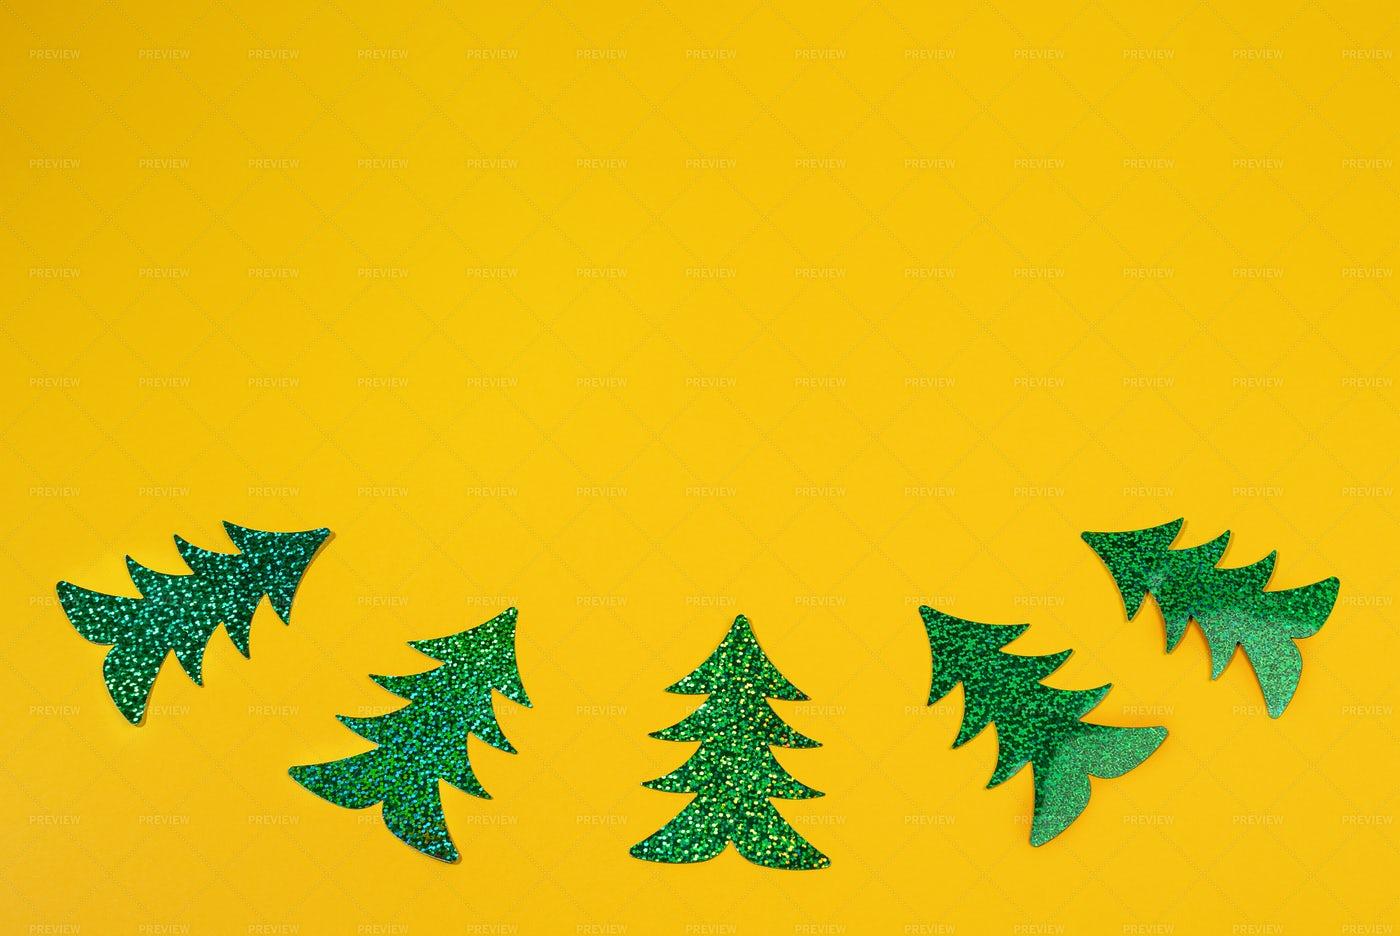 Xmas Trees In Yellow: Stock Photos